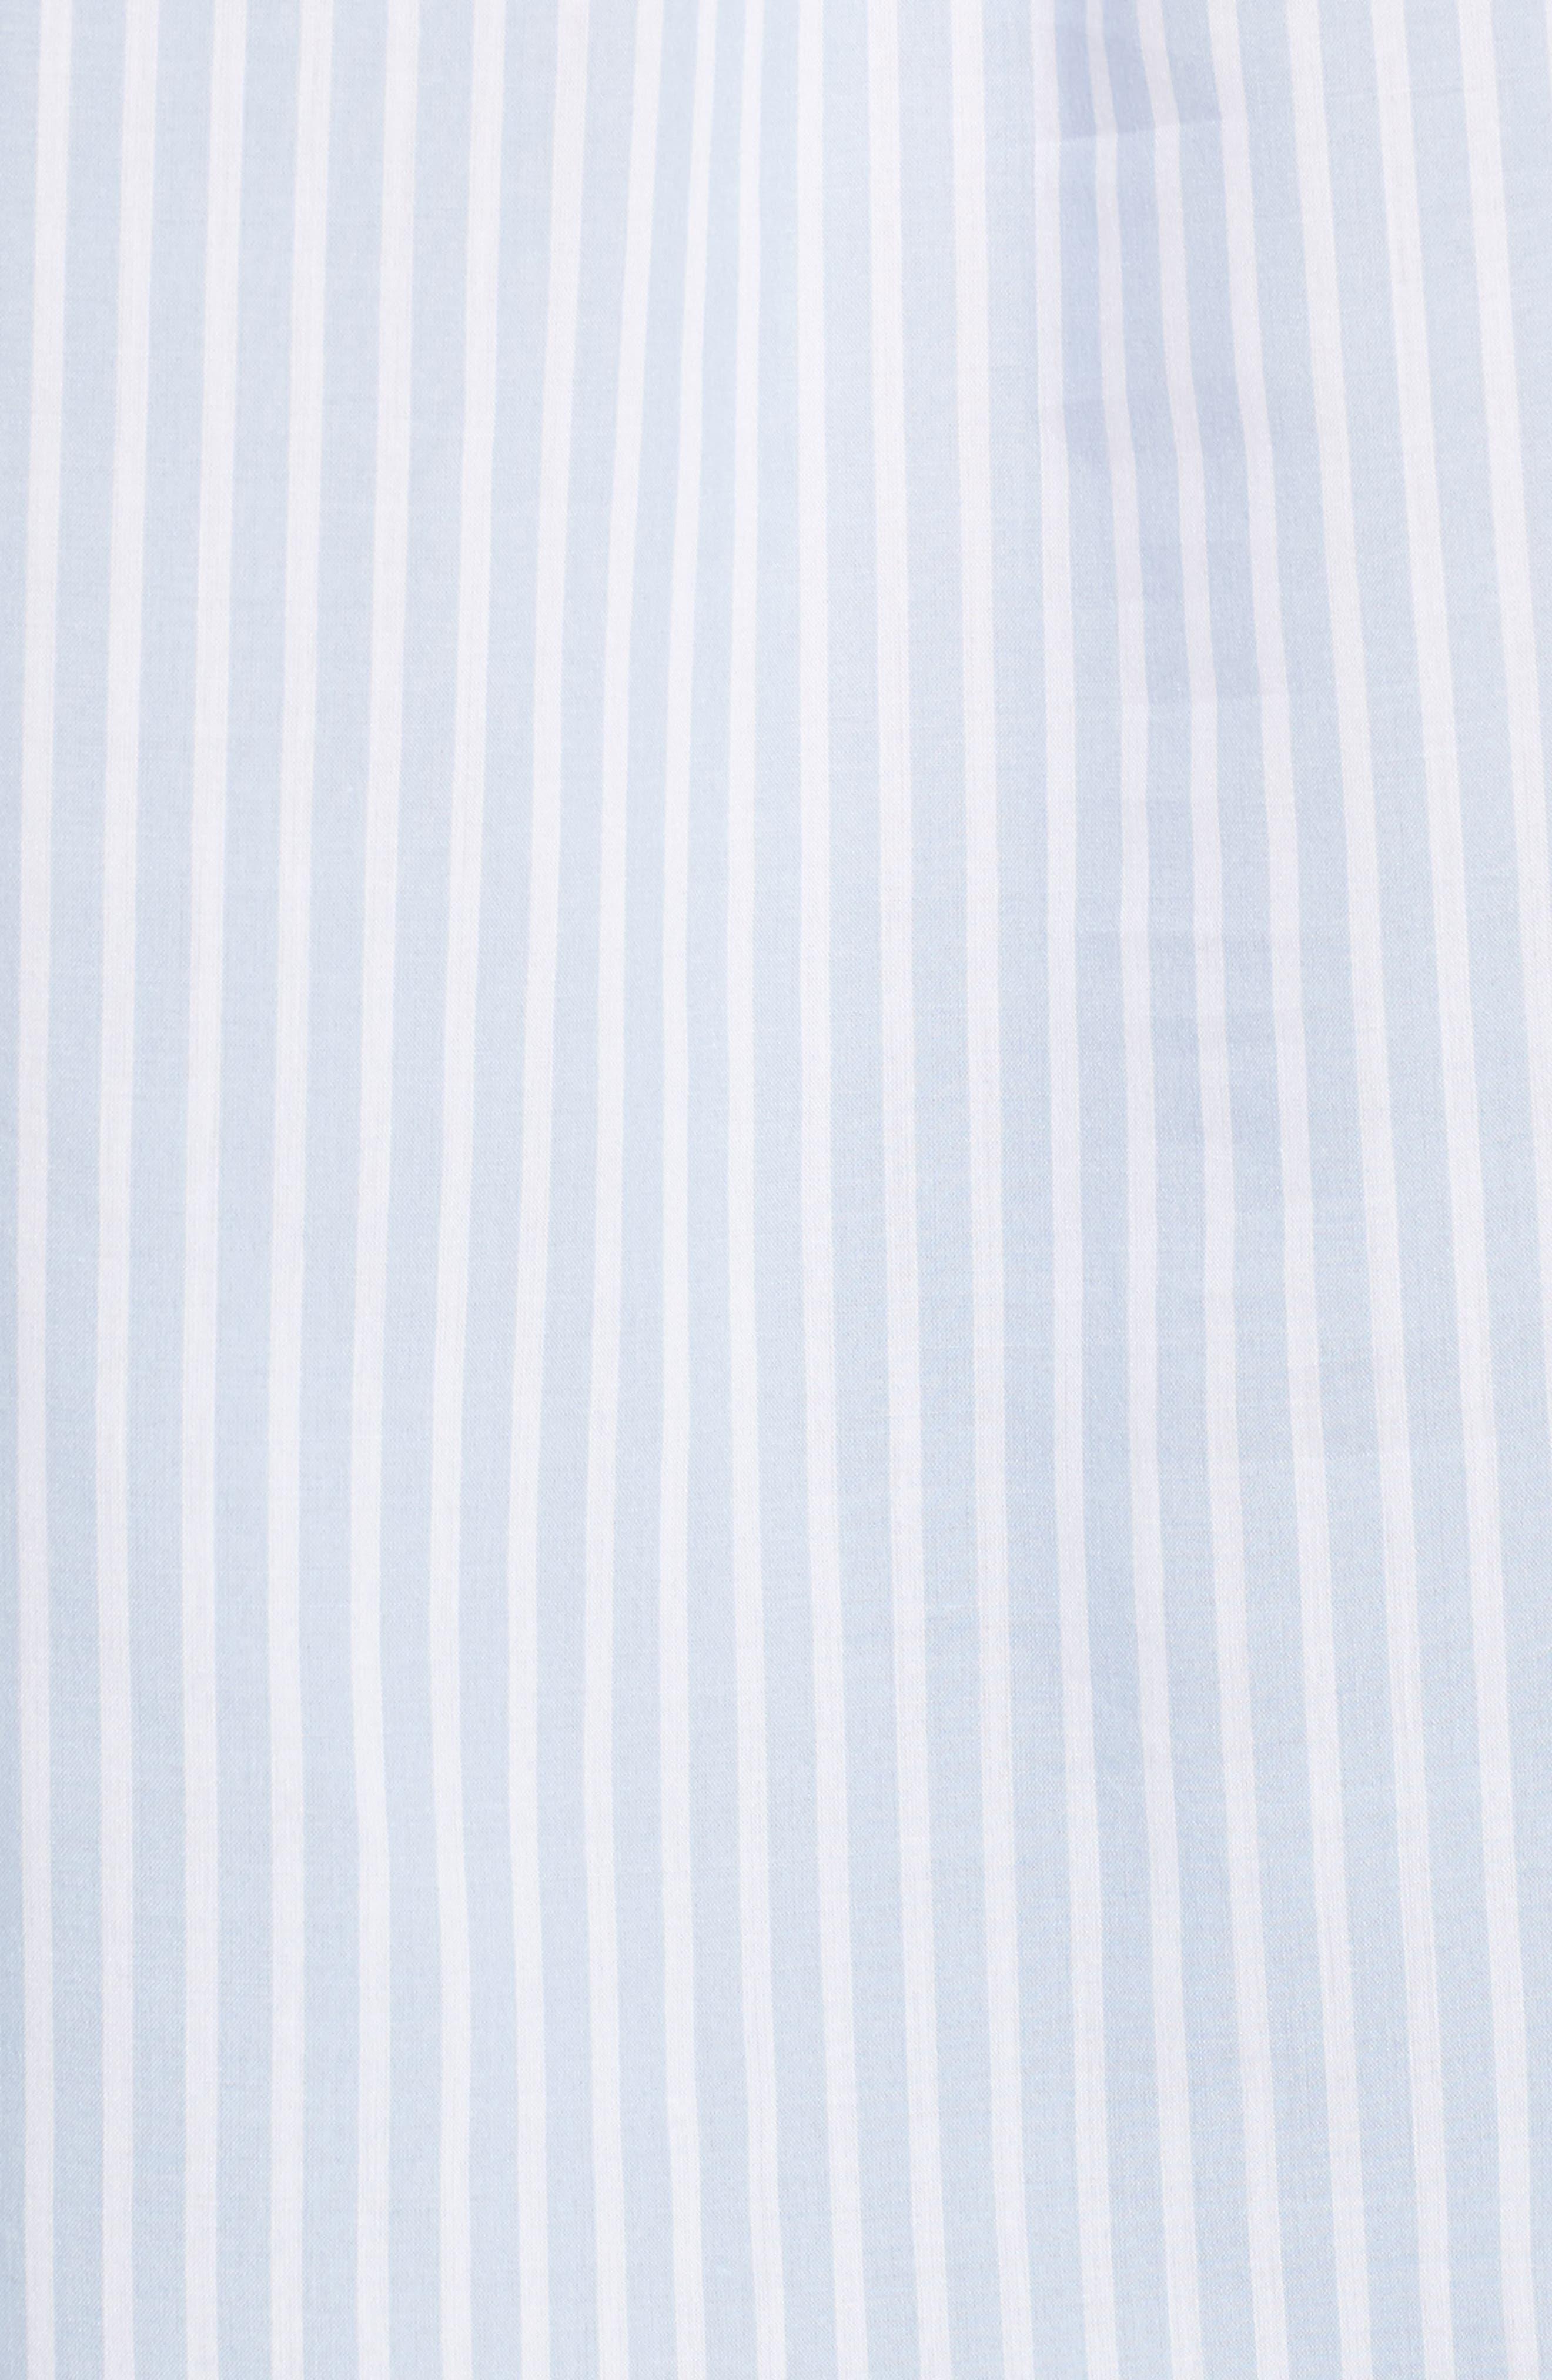 Stripe Bell Sleeve Top,                             Alternate thumbnail 5, color,                             456